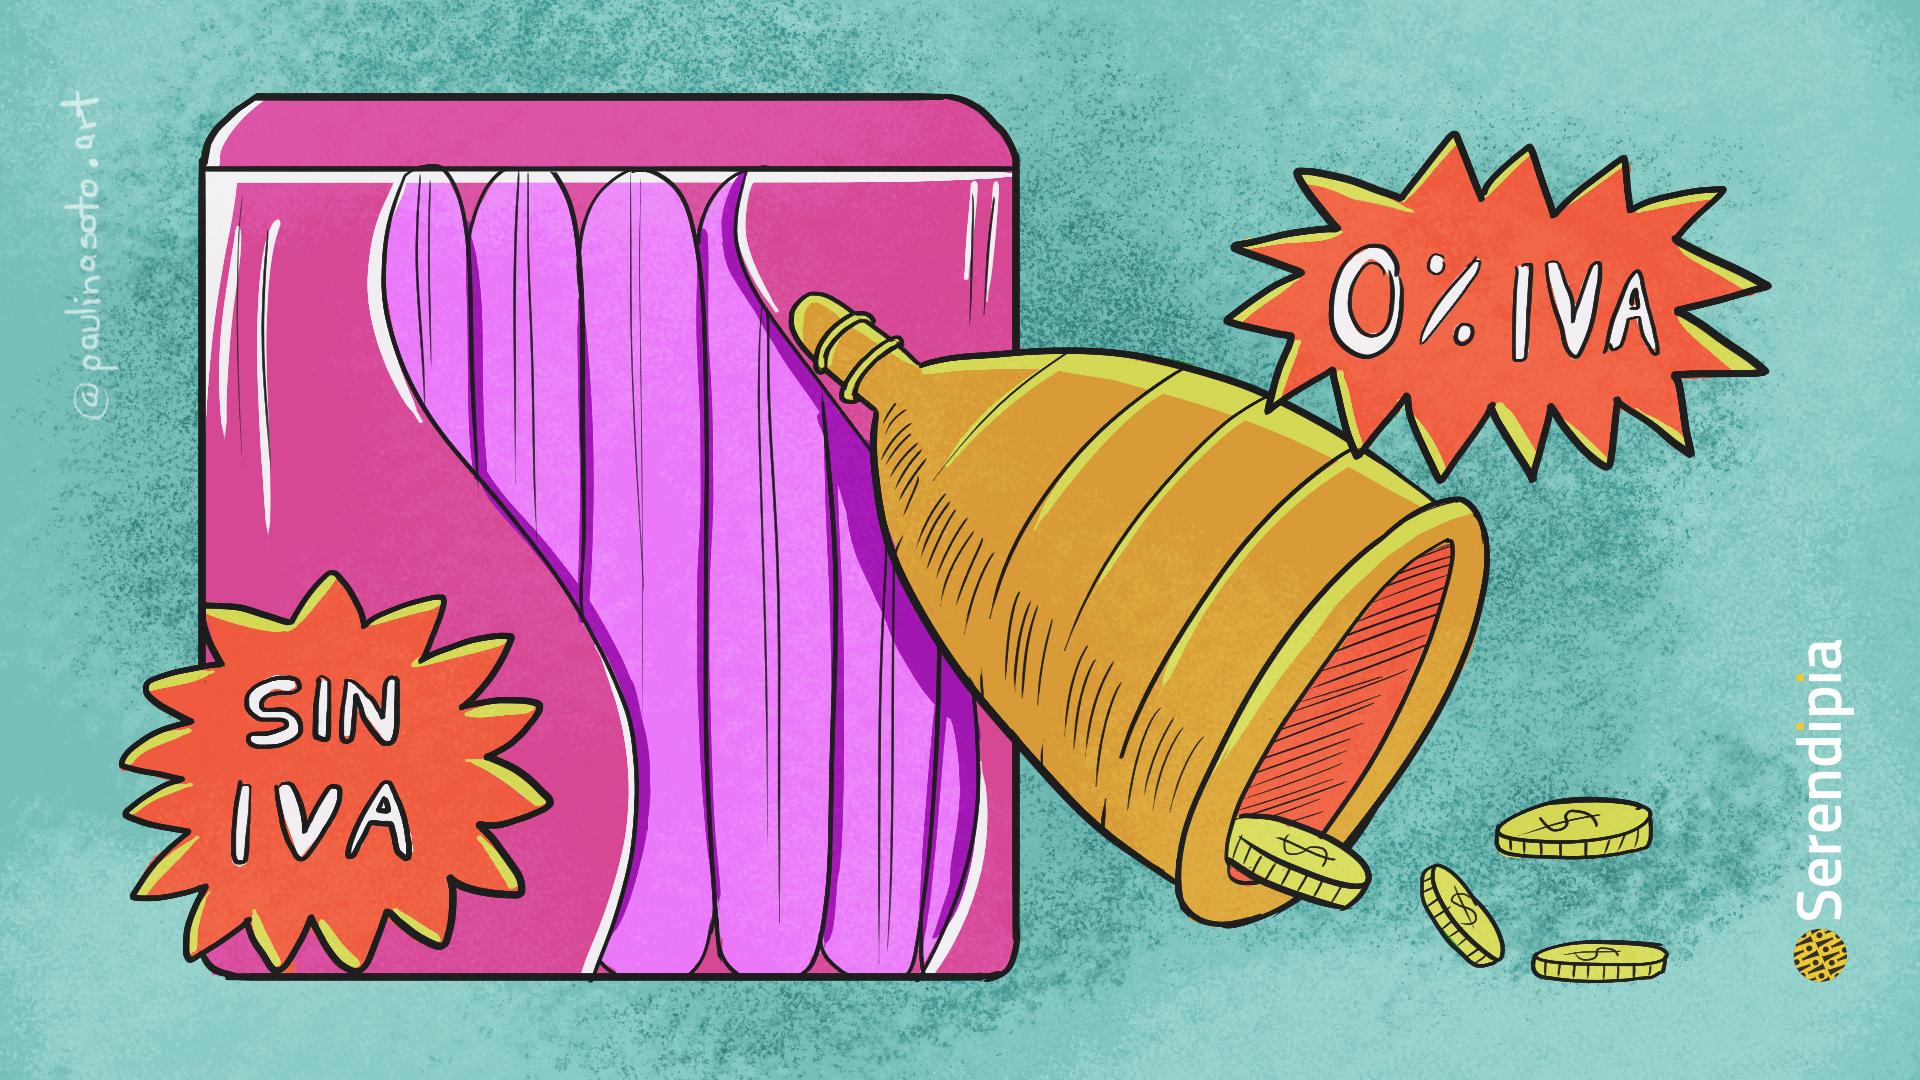 eliminan iva a productos menstruales